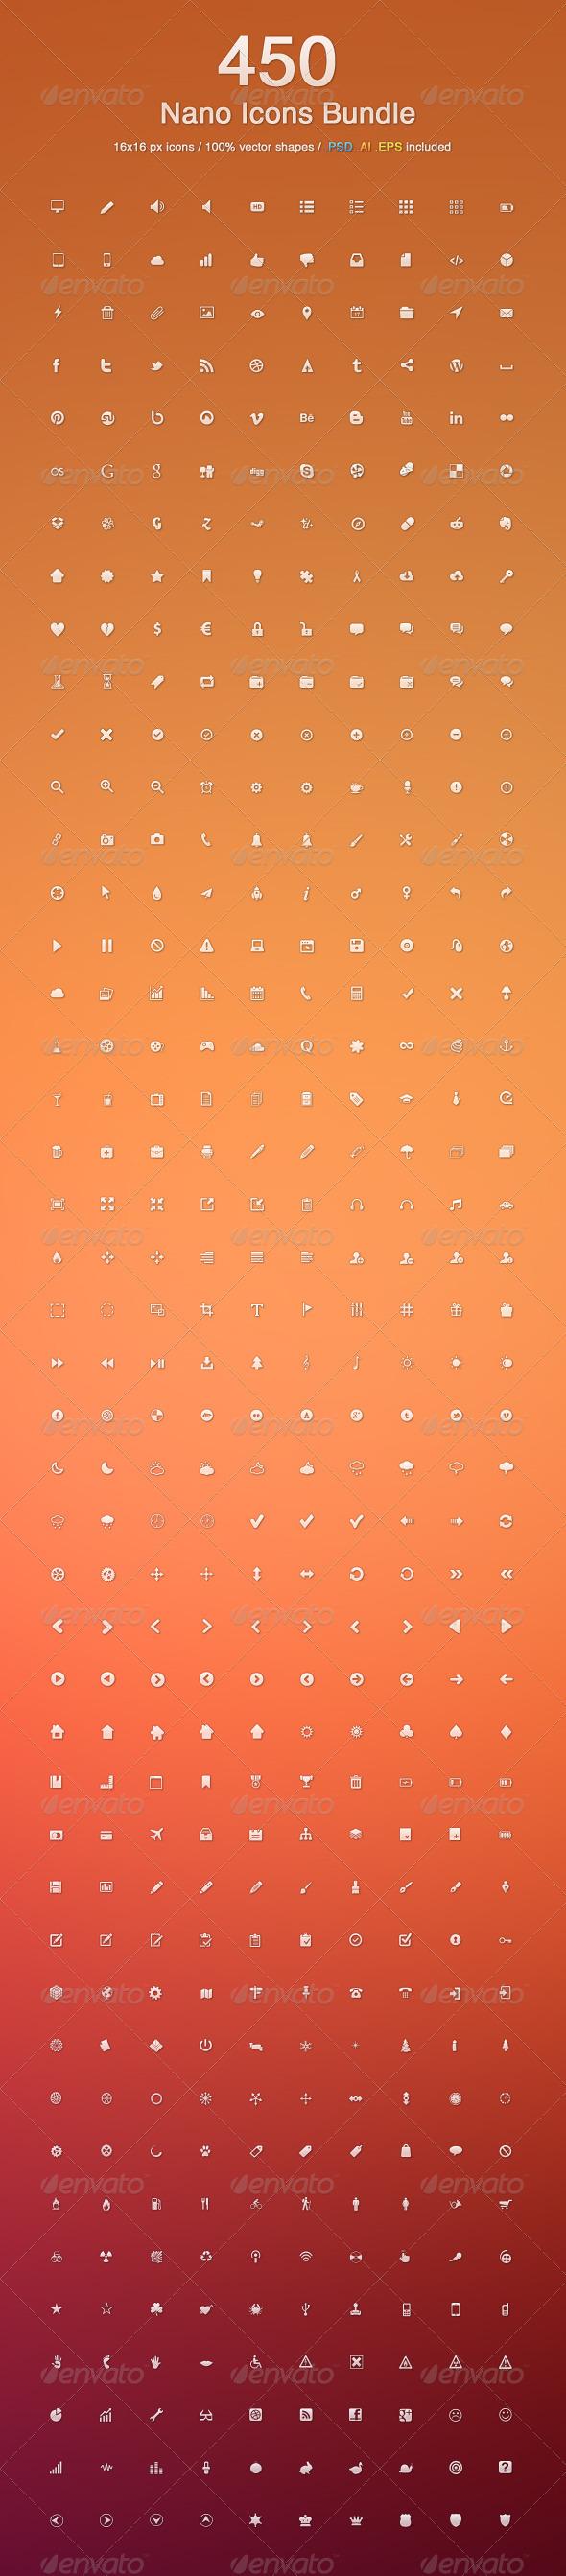 GraphicRiver 450 Nano Icons Bundle 3376075